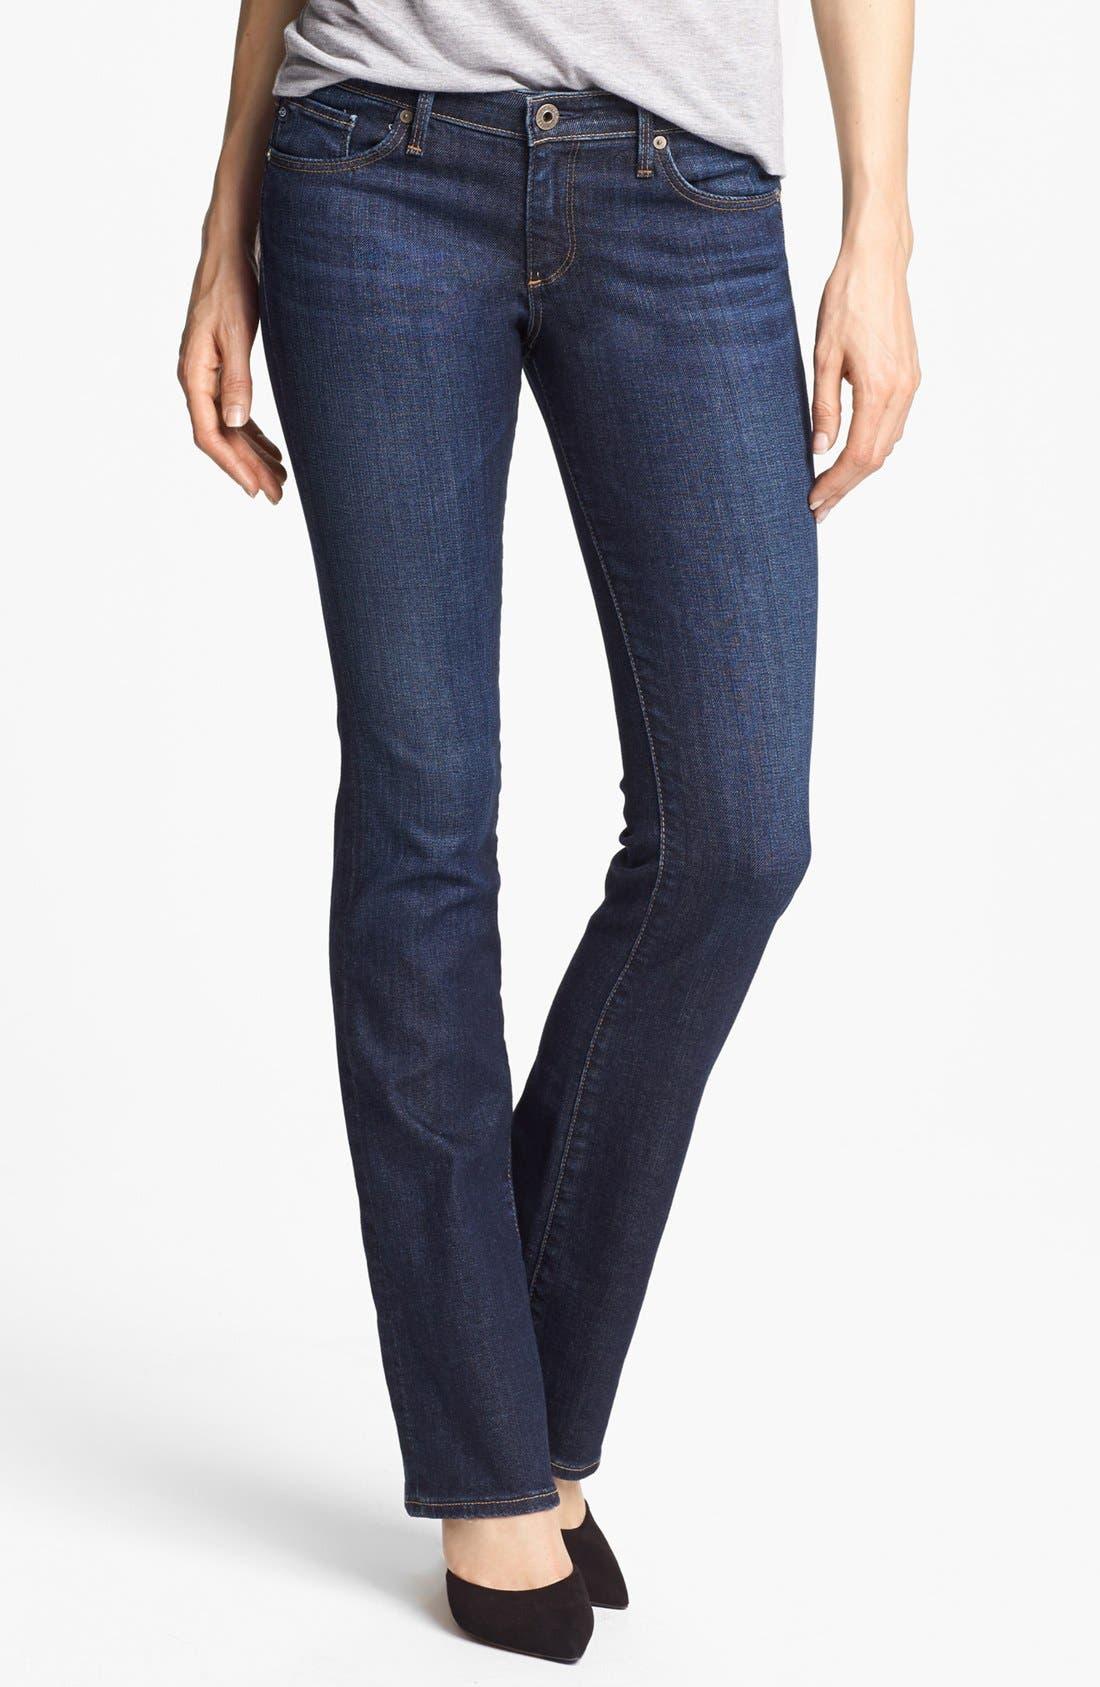 Alternate Image 1 Selected - AG 'Olivia' Skinny Bootcut Jeans (Crest Blue)